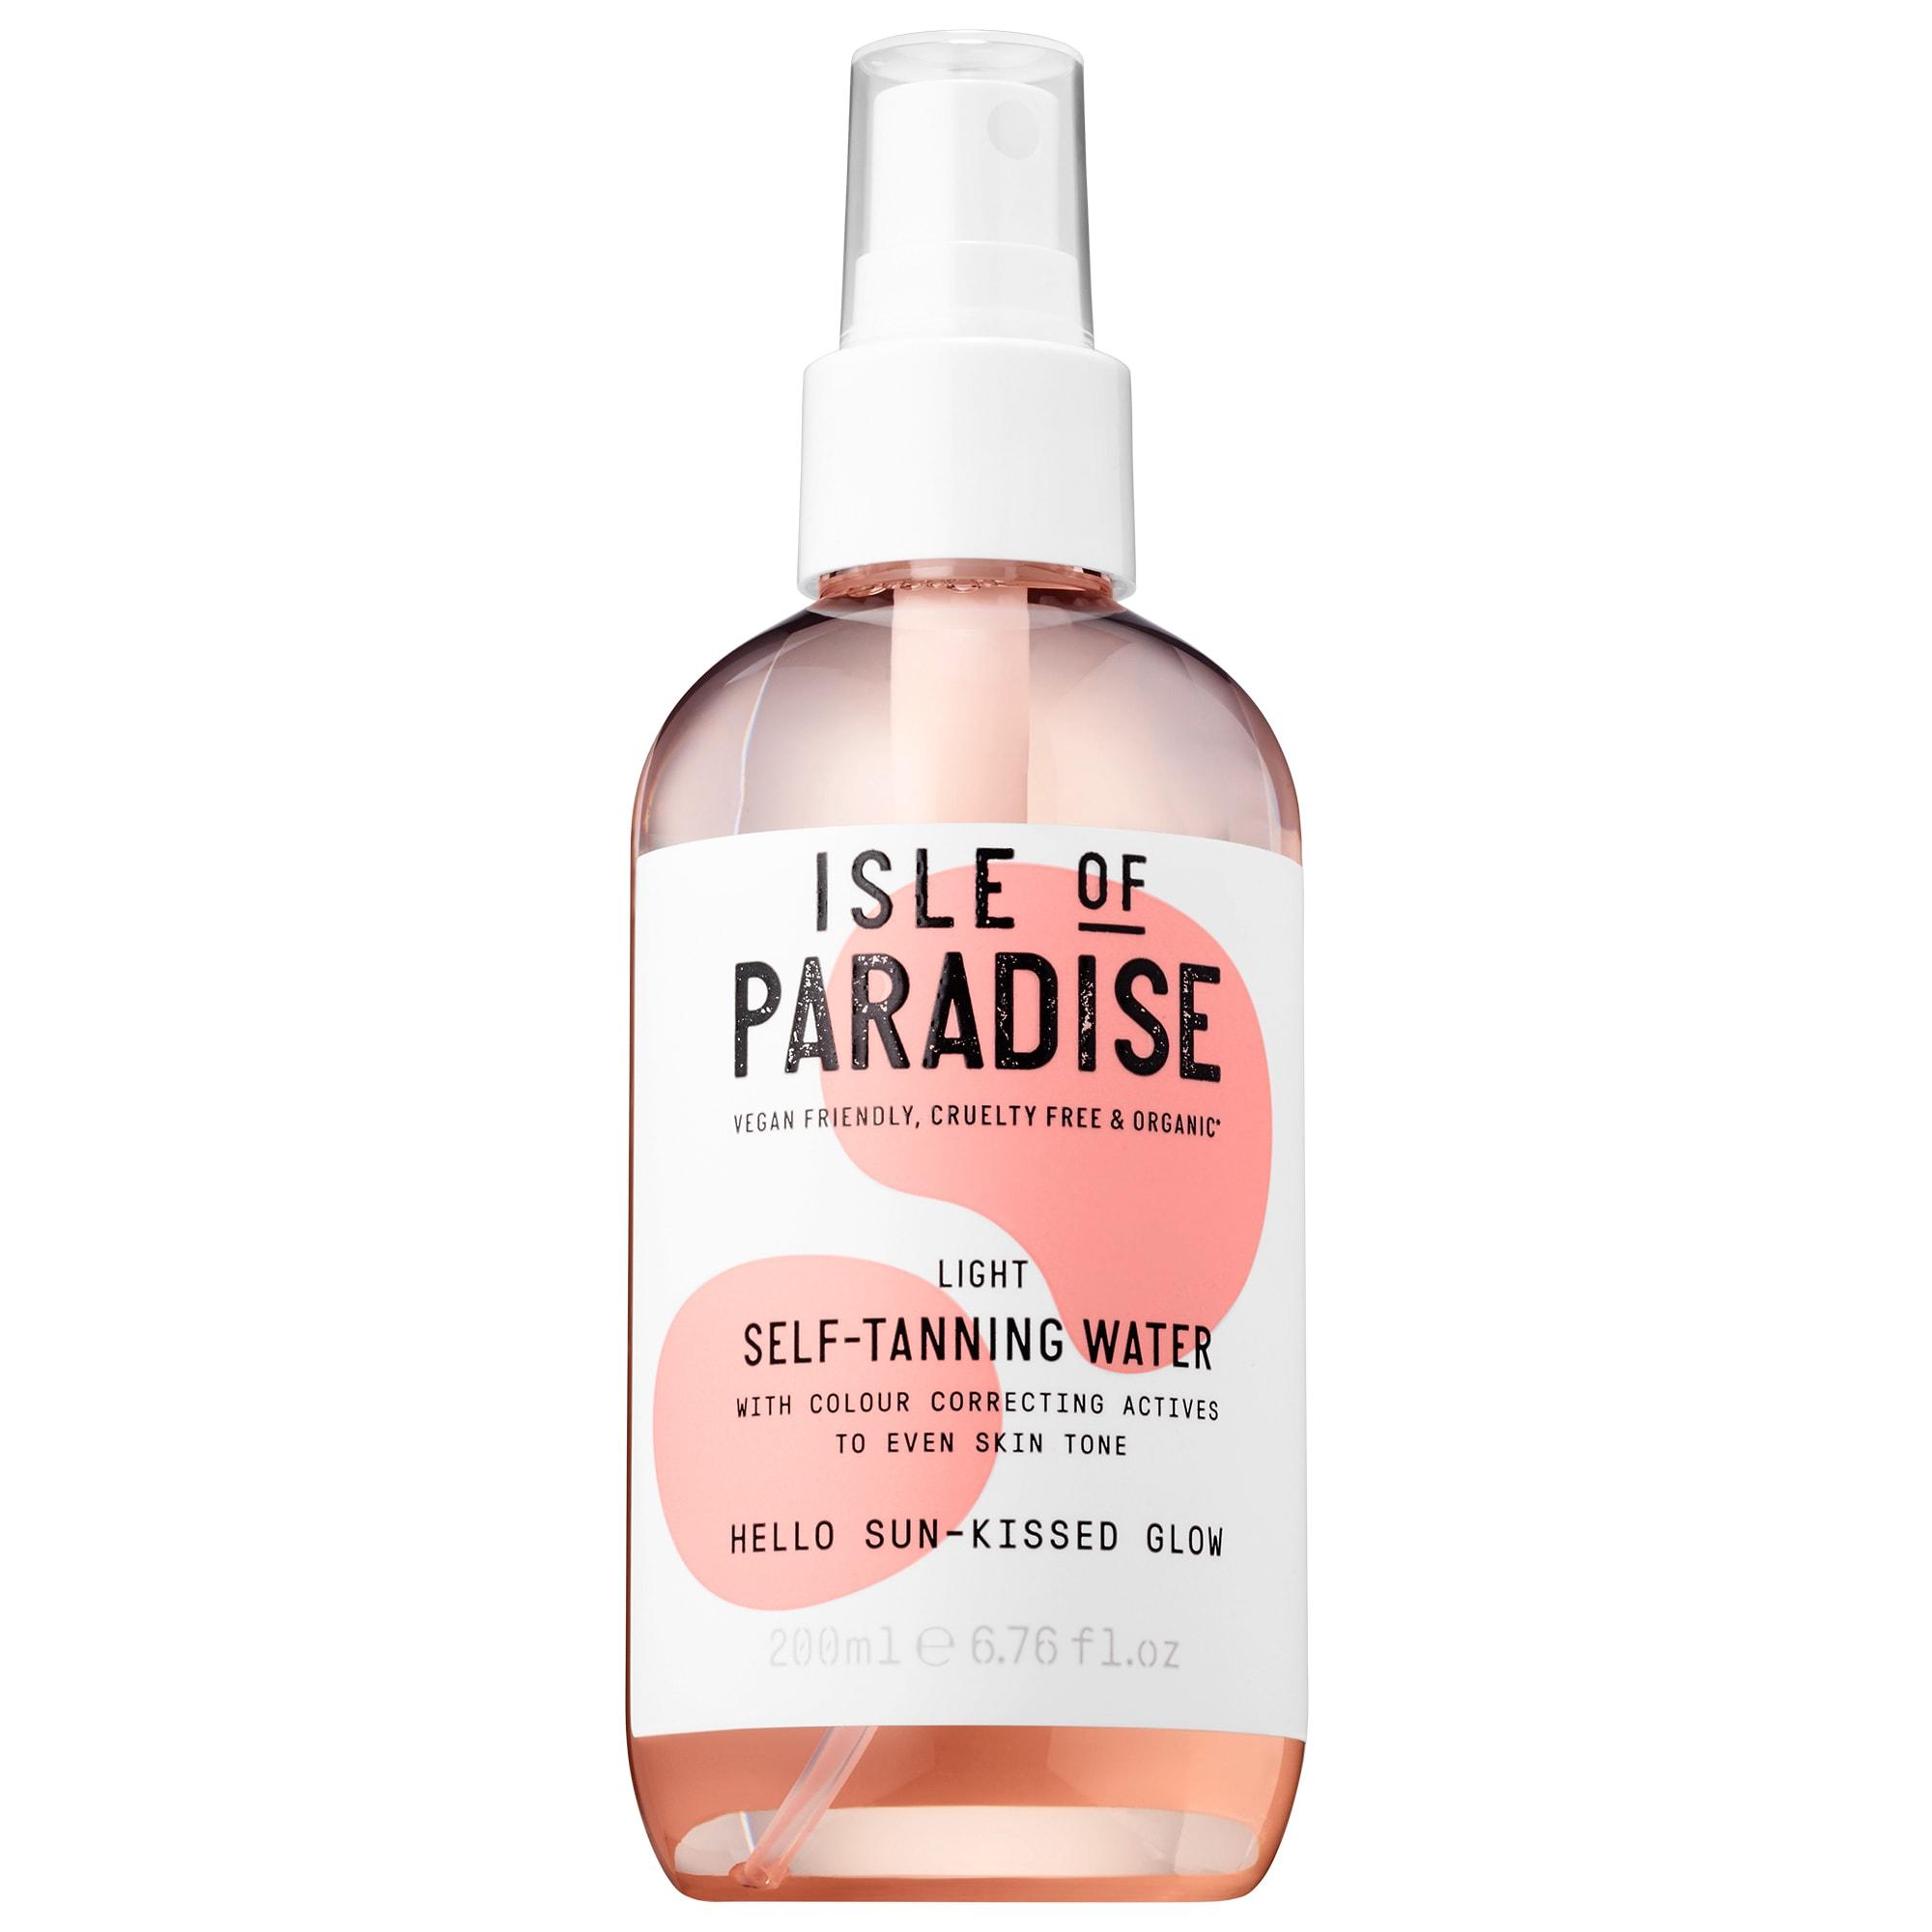 Isle of Paradise - Self-Tanning Water